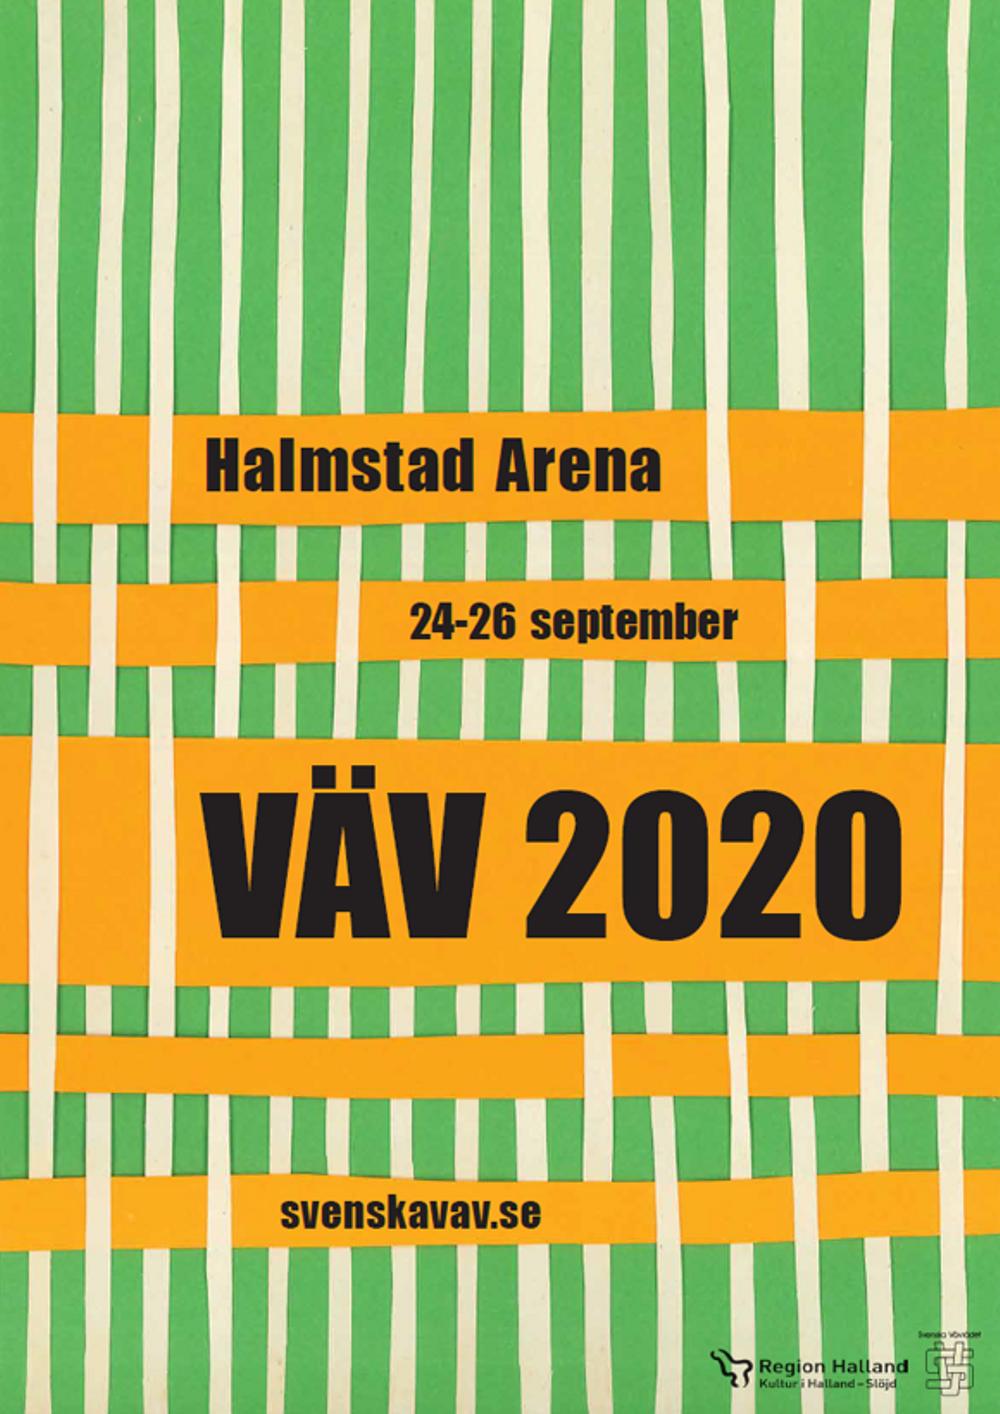 Halmstad Arena, 24-26 september, VÄV 2020, svenskavav.se.